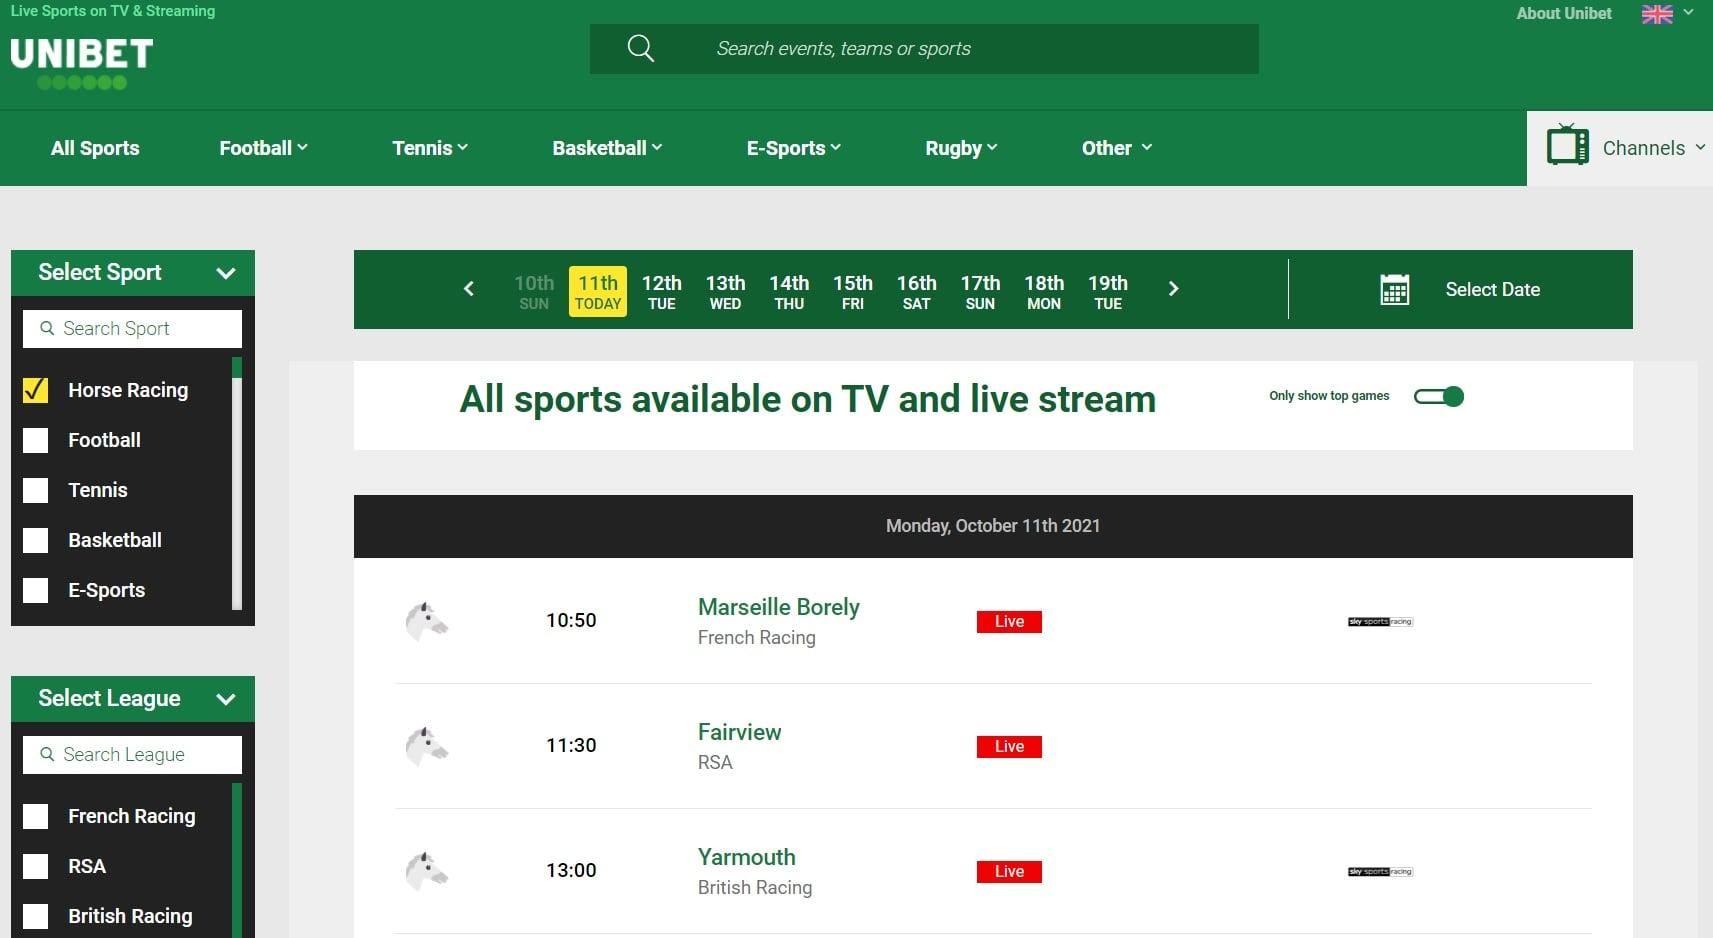 Unibet live horse racing streaming sites